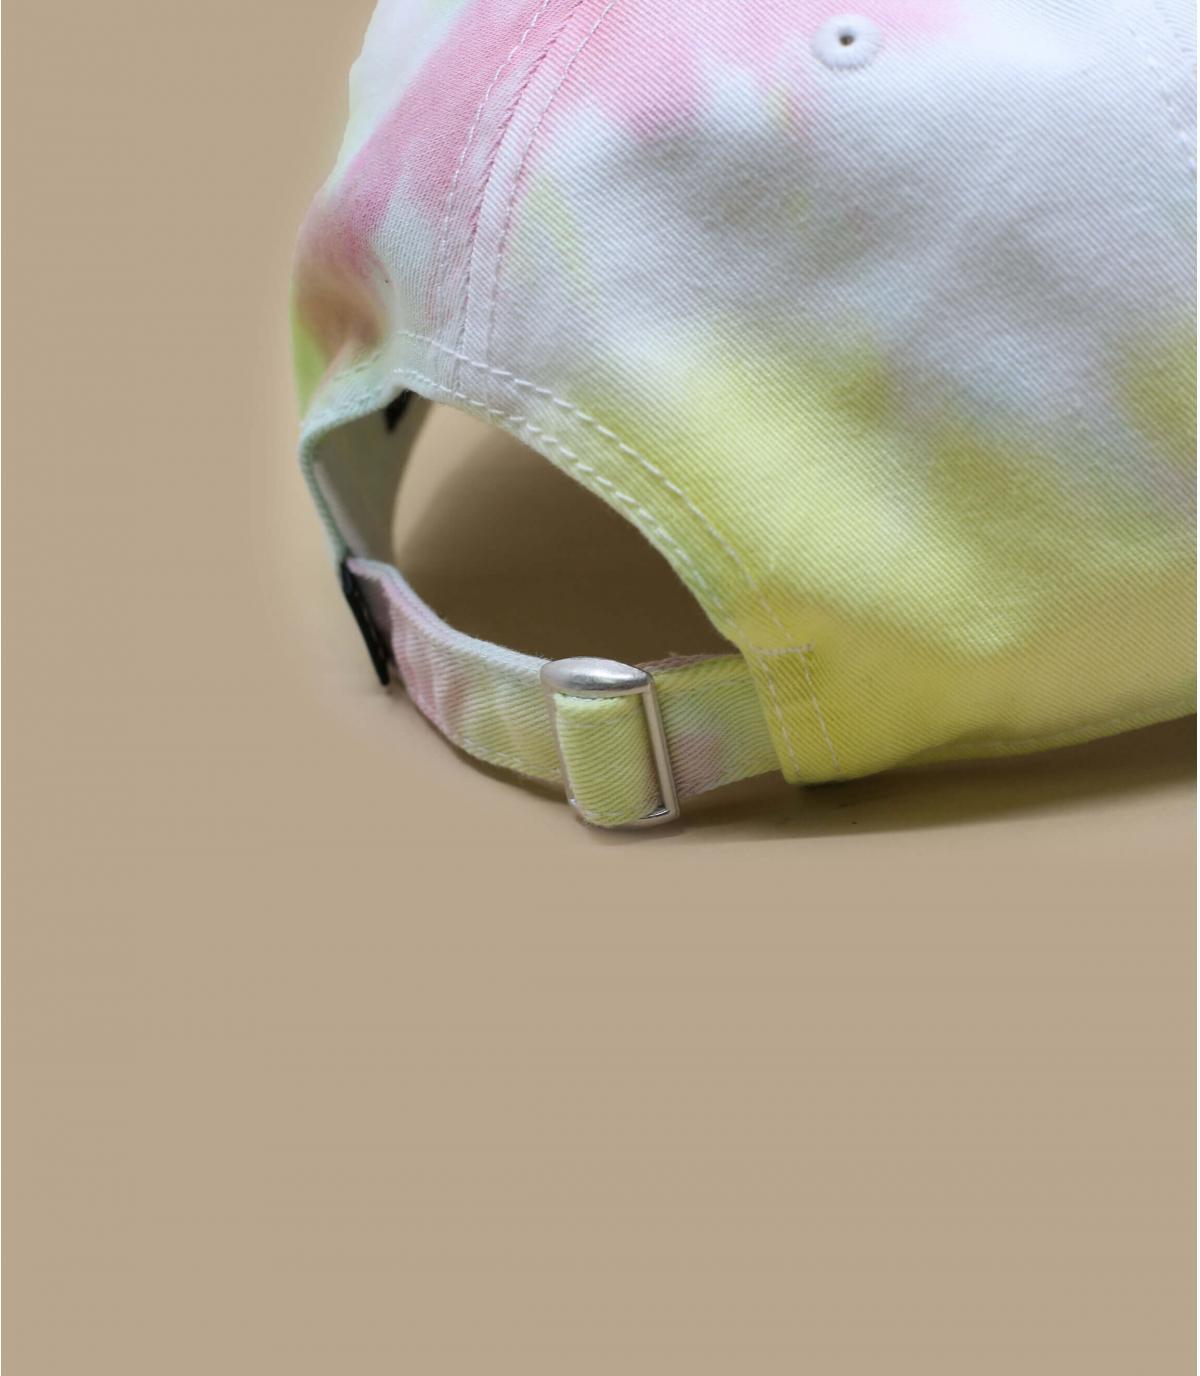 Dettagli Kalsman pink - image 4